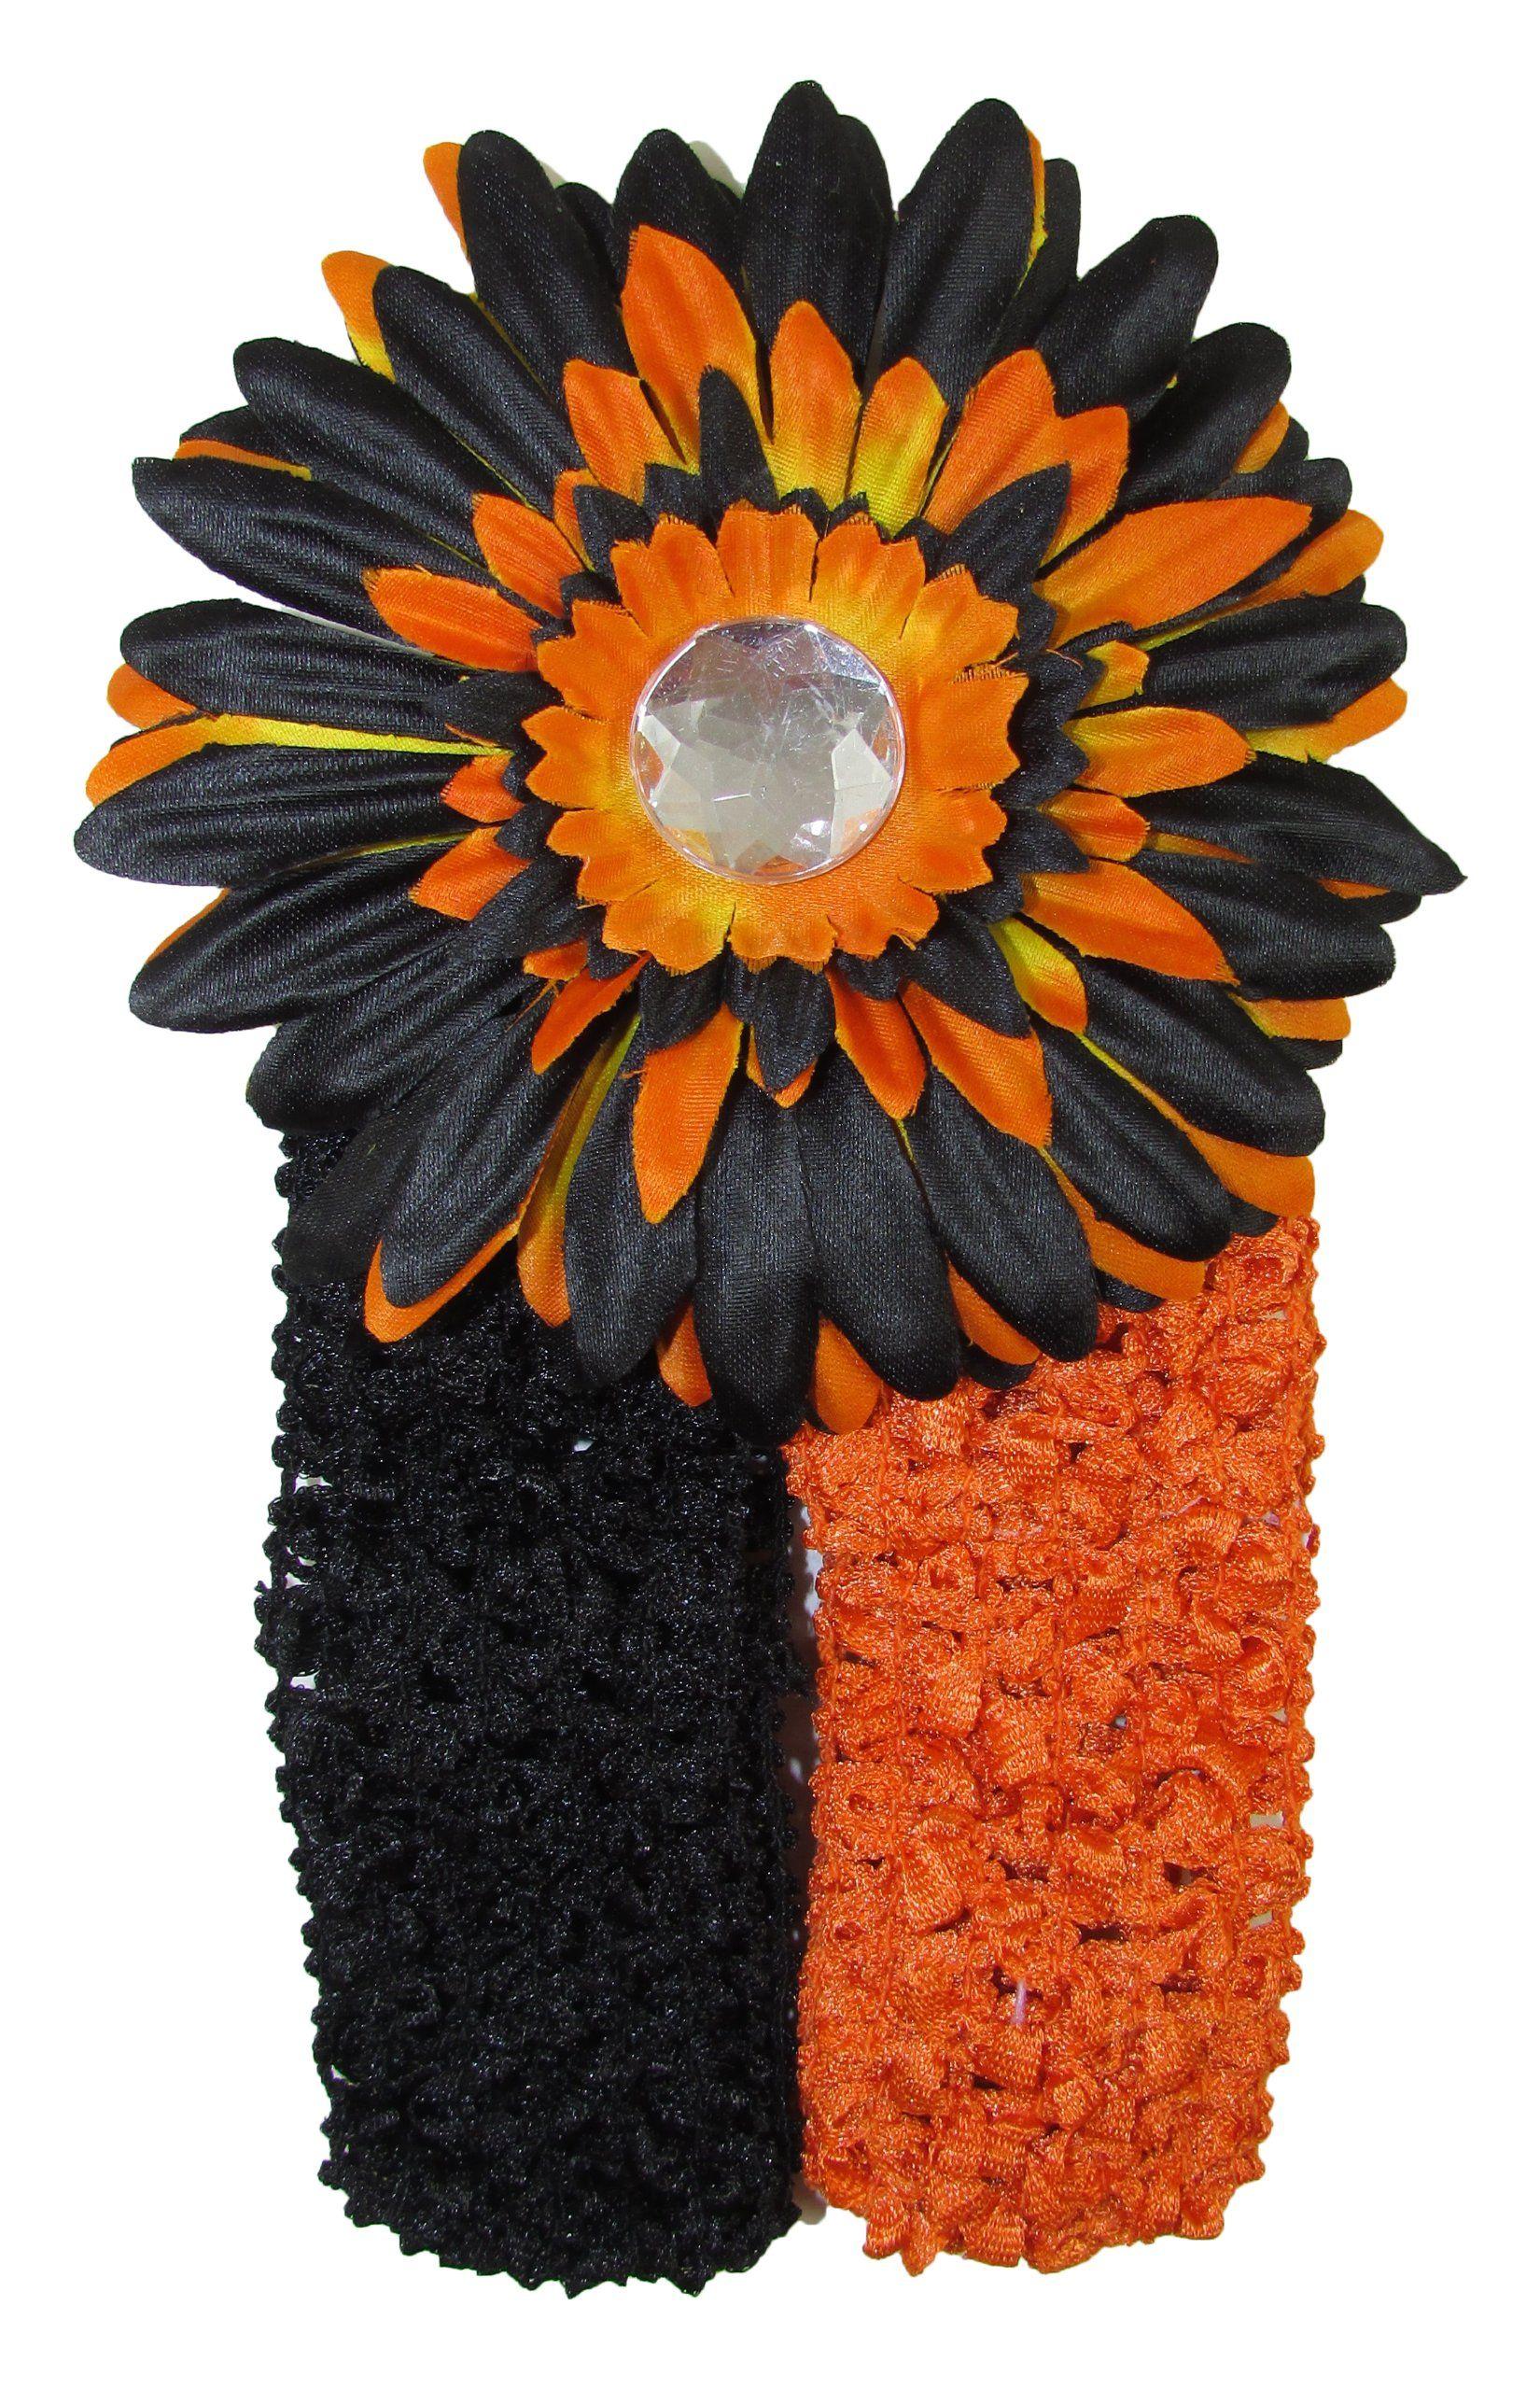 "Halloween Crochet Headbands with Black & Orange Flower Clip. Black & Orange 1.5"" Crochet Headbands. Black & Orange Gerber Daisy Flower Clip."